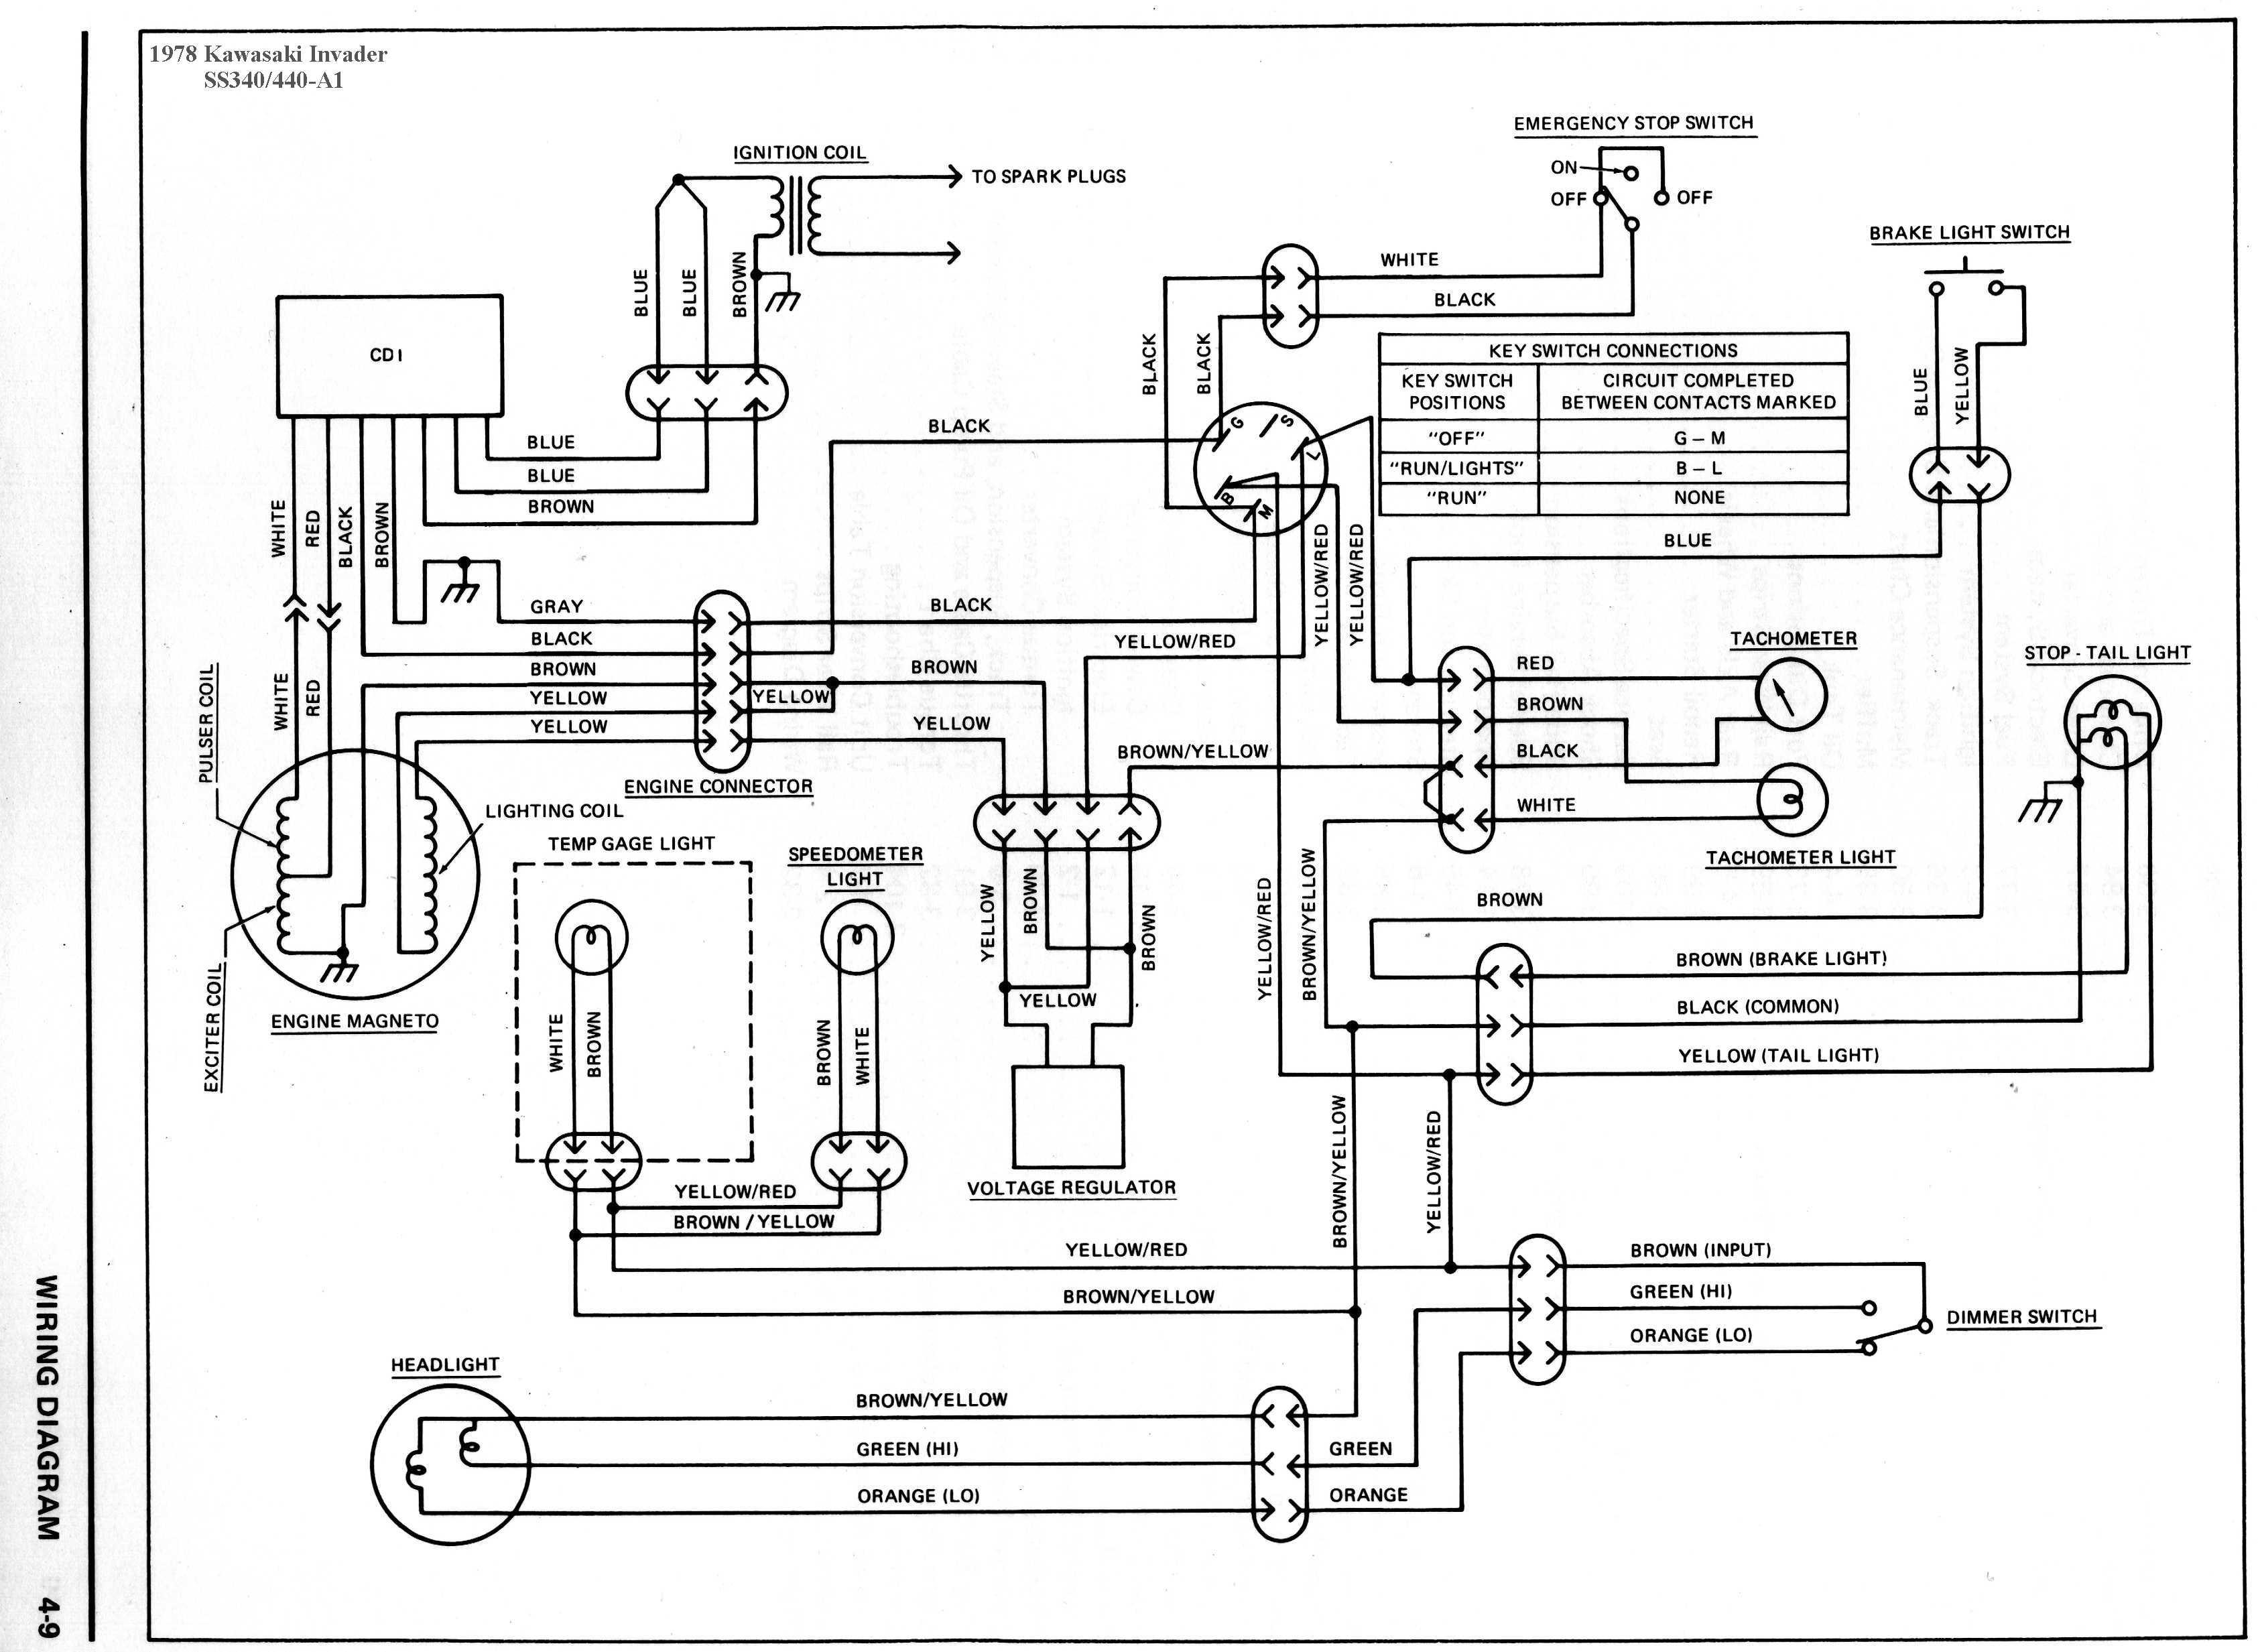 wiring diagram 1986 kawasaki zx600r wiring diagrams detailed rh 20 lopre expedition nubis de